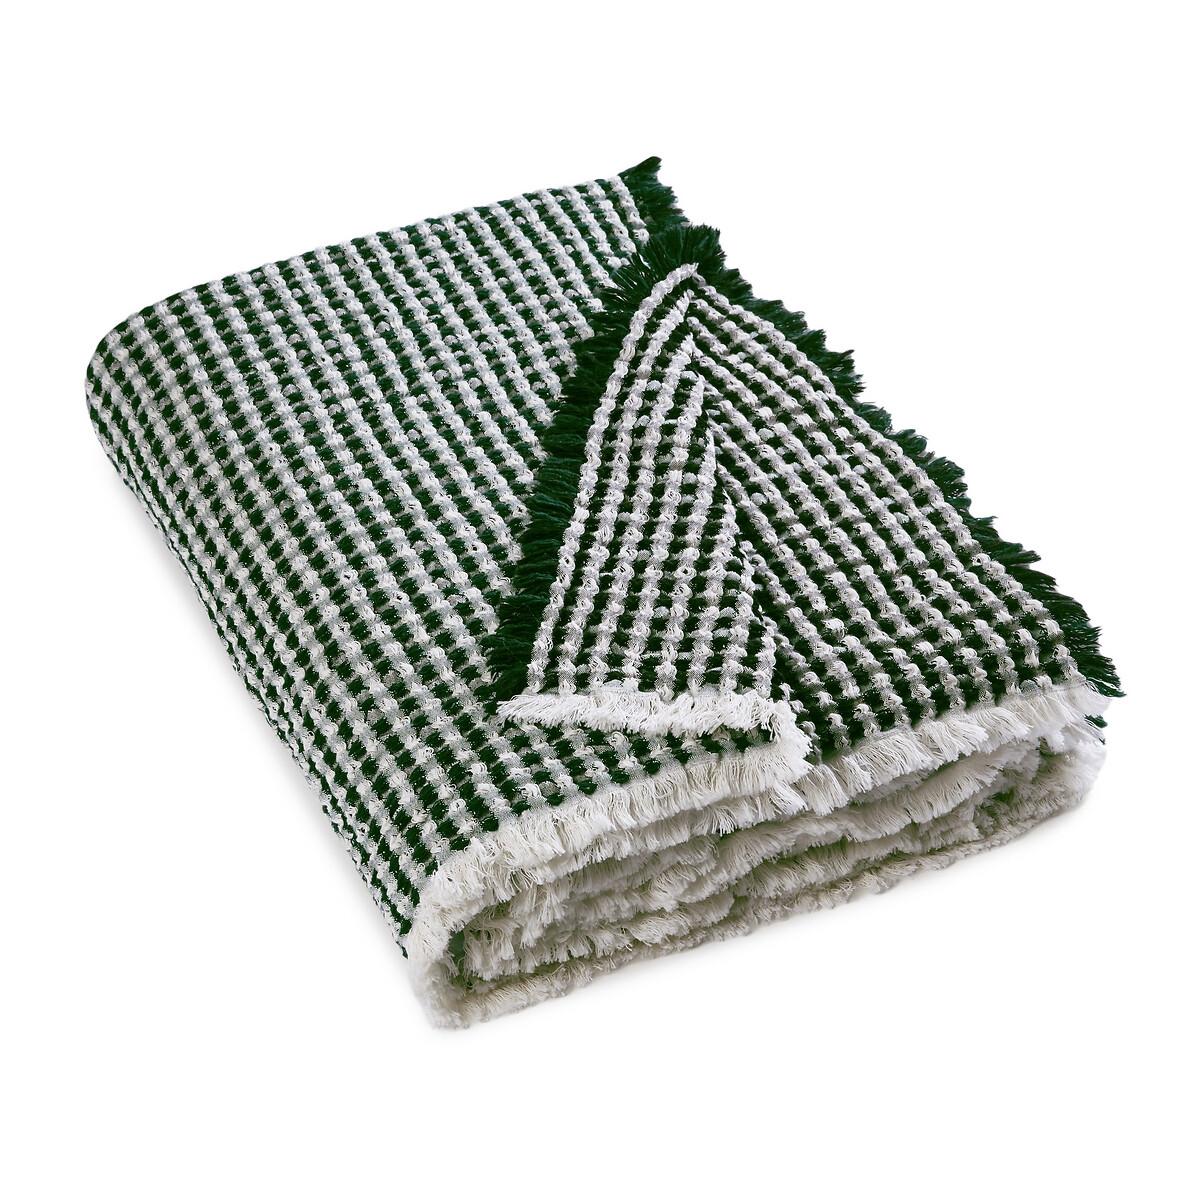 Плед LaRedoute Из хлопка и шерсти Moutyan 130 x 170 см зеленый